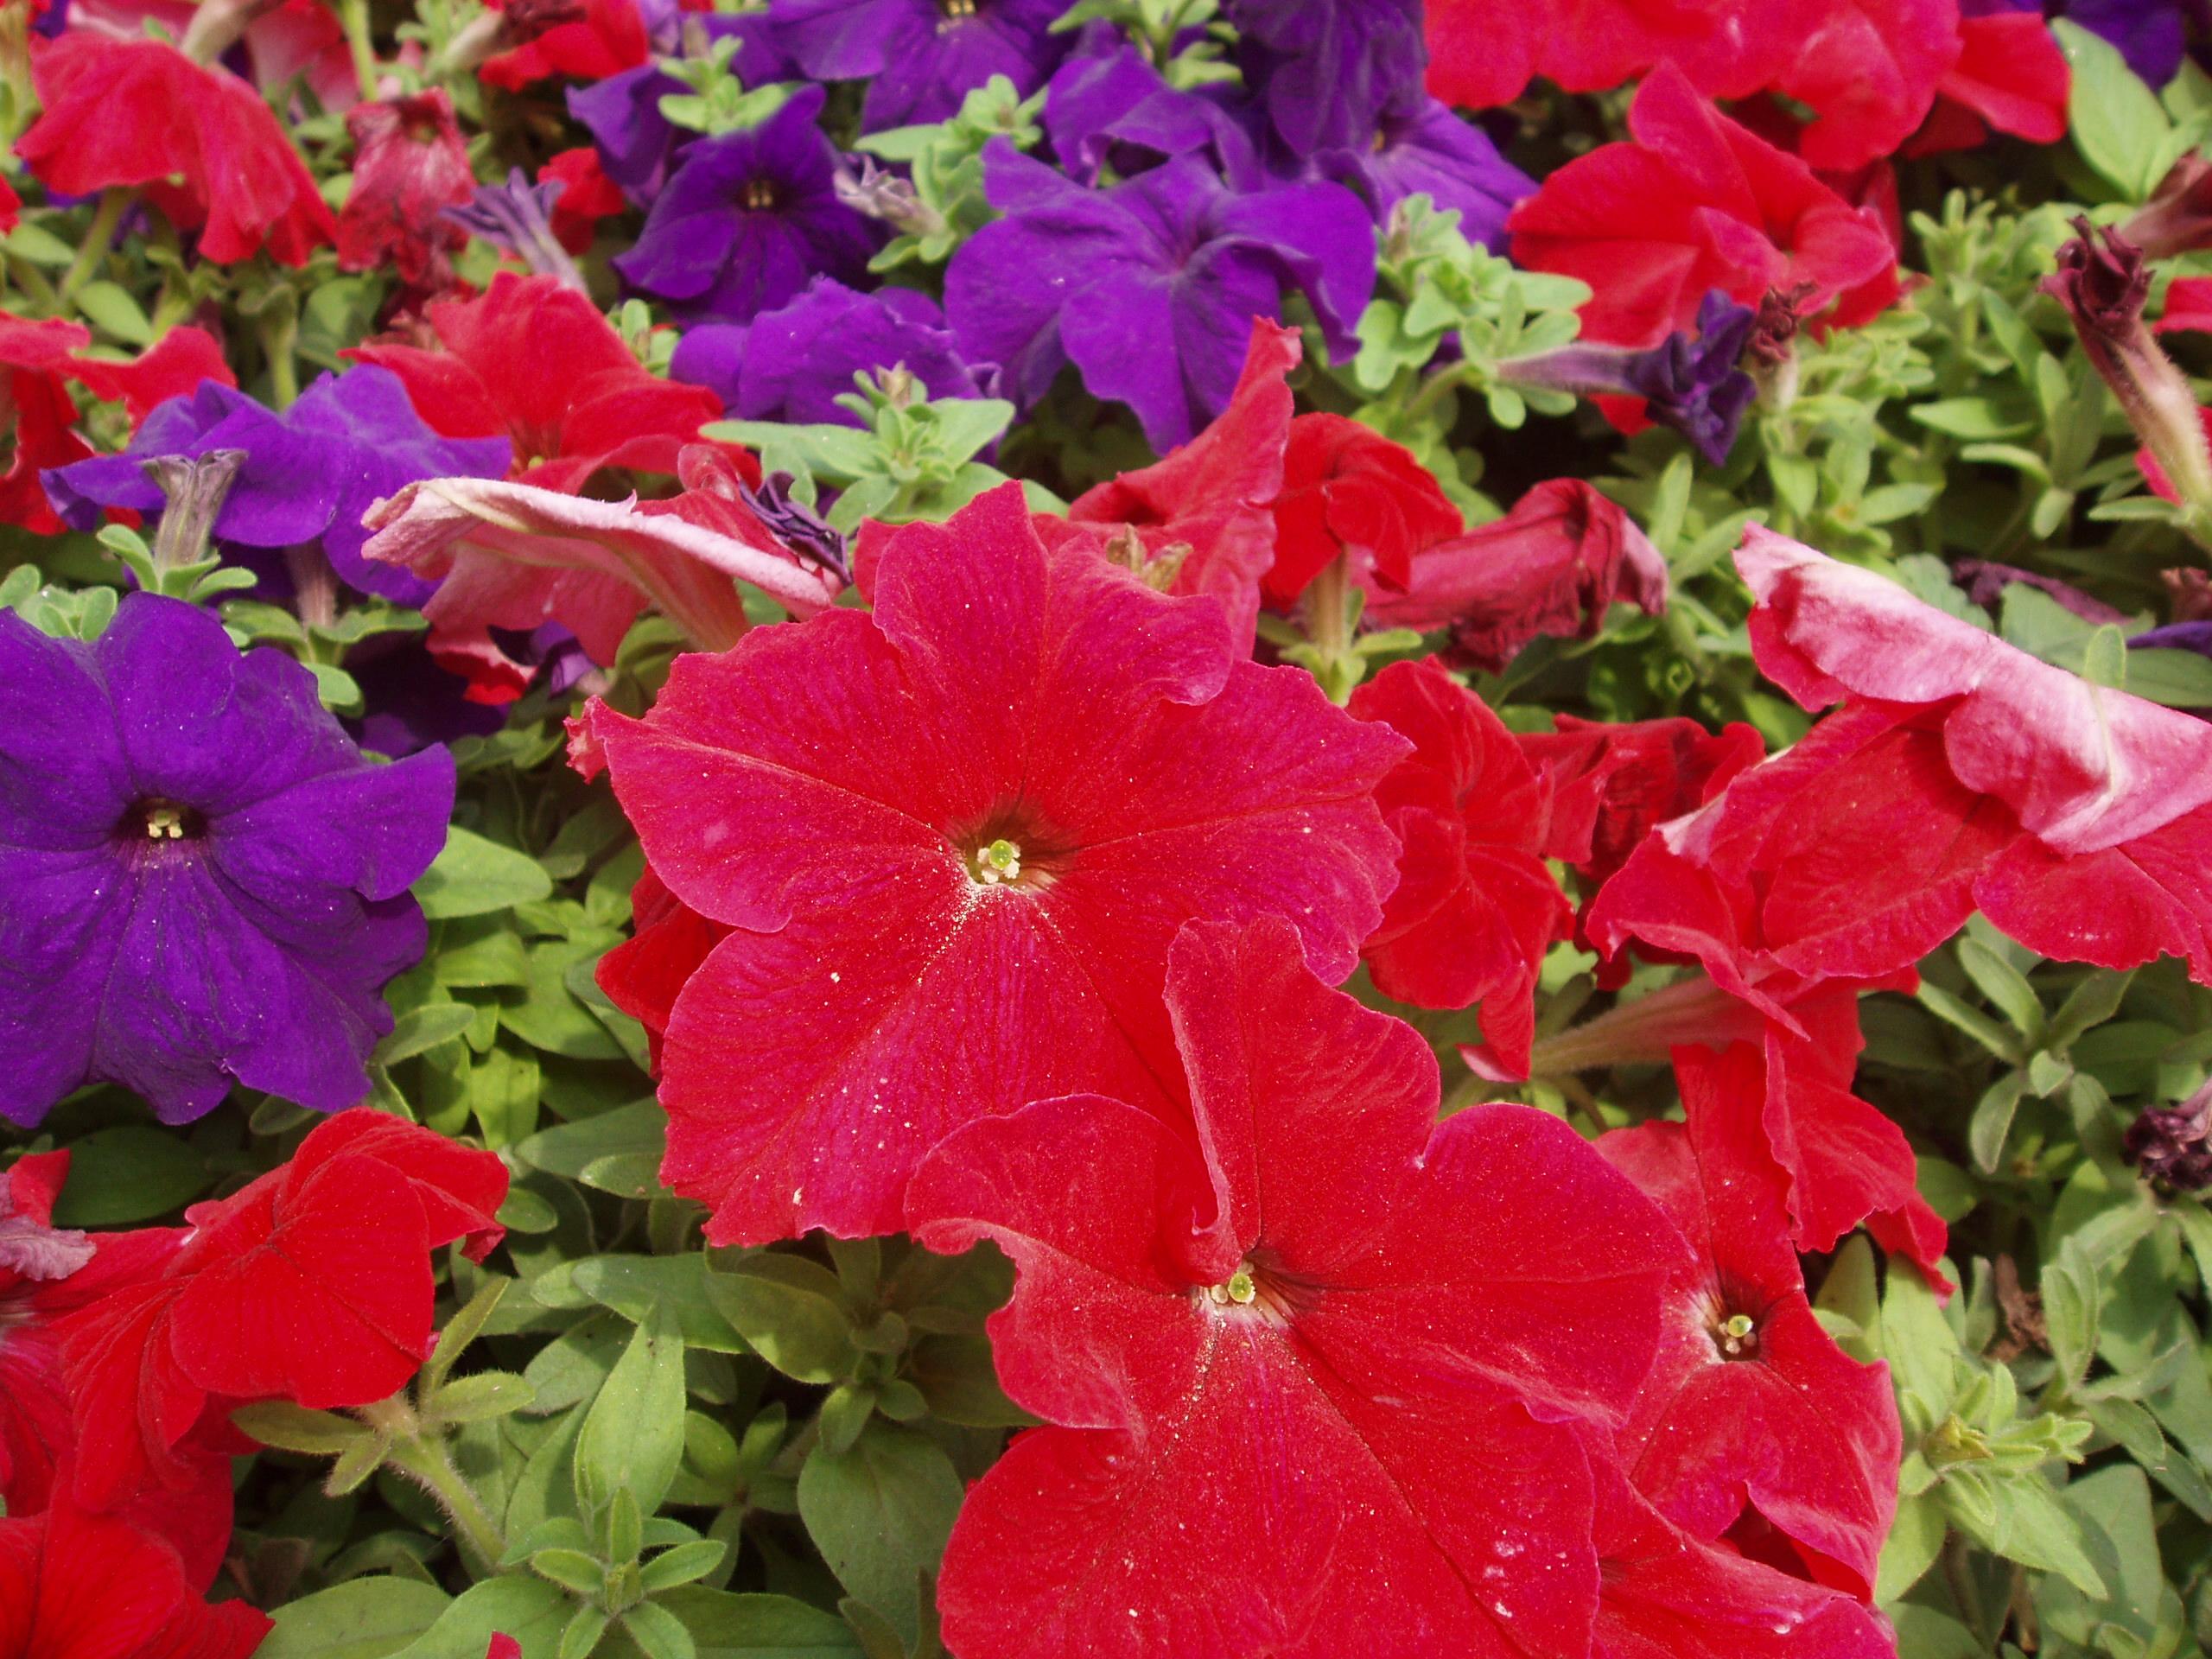 Petunia. (Solanaceae). Nightshade Family.